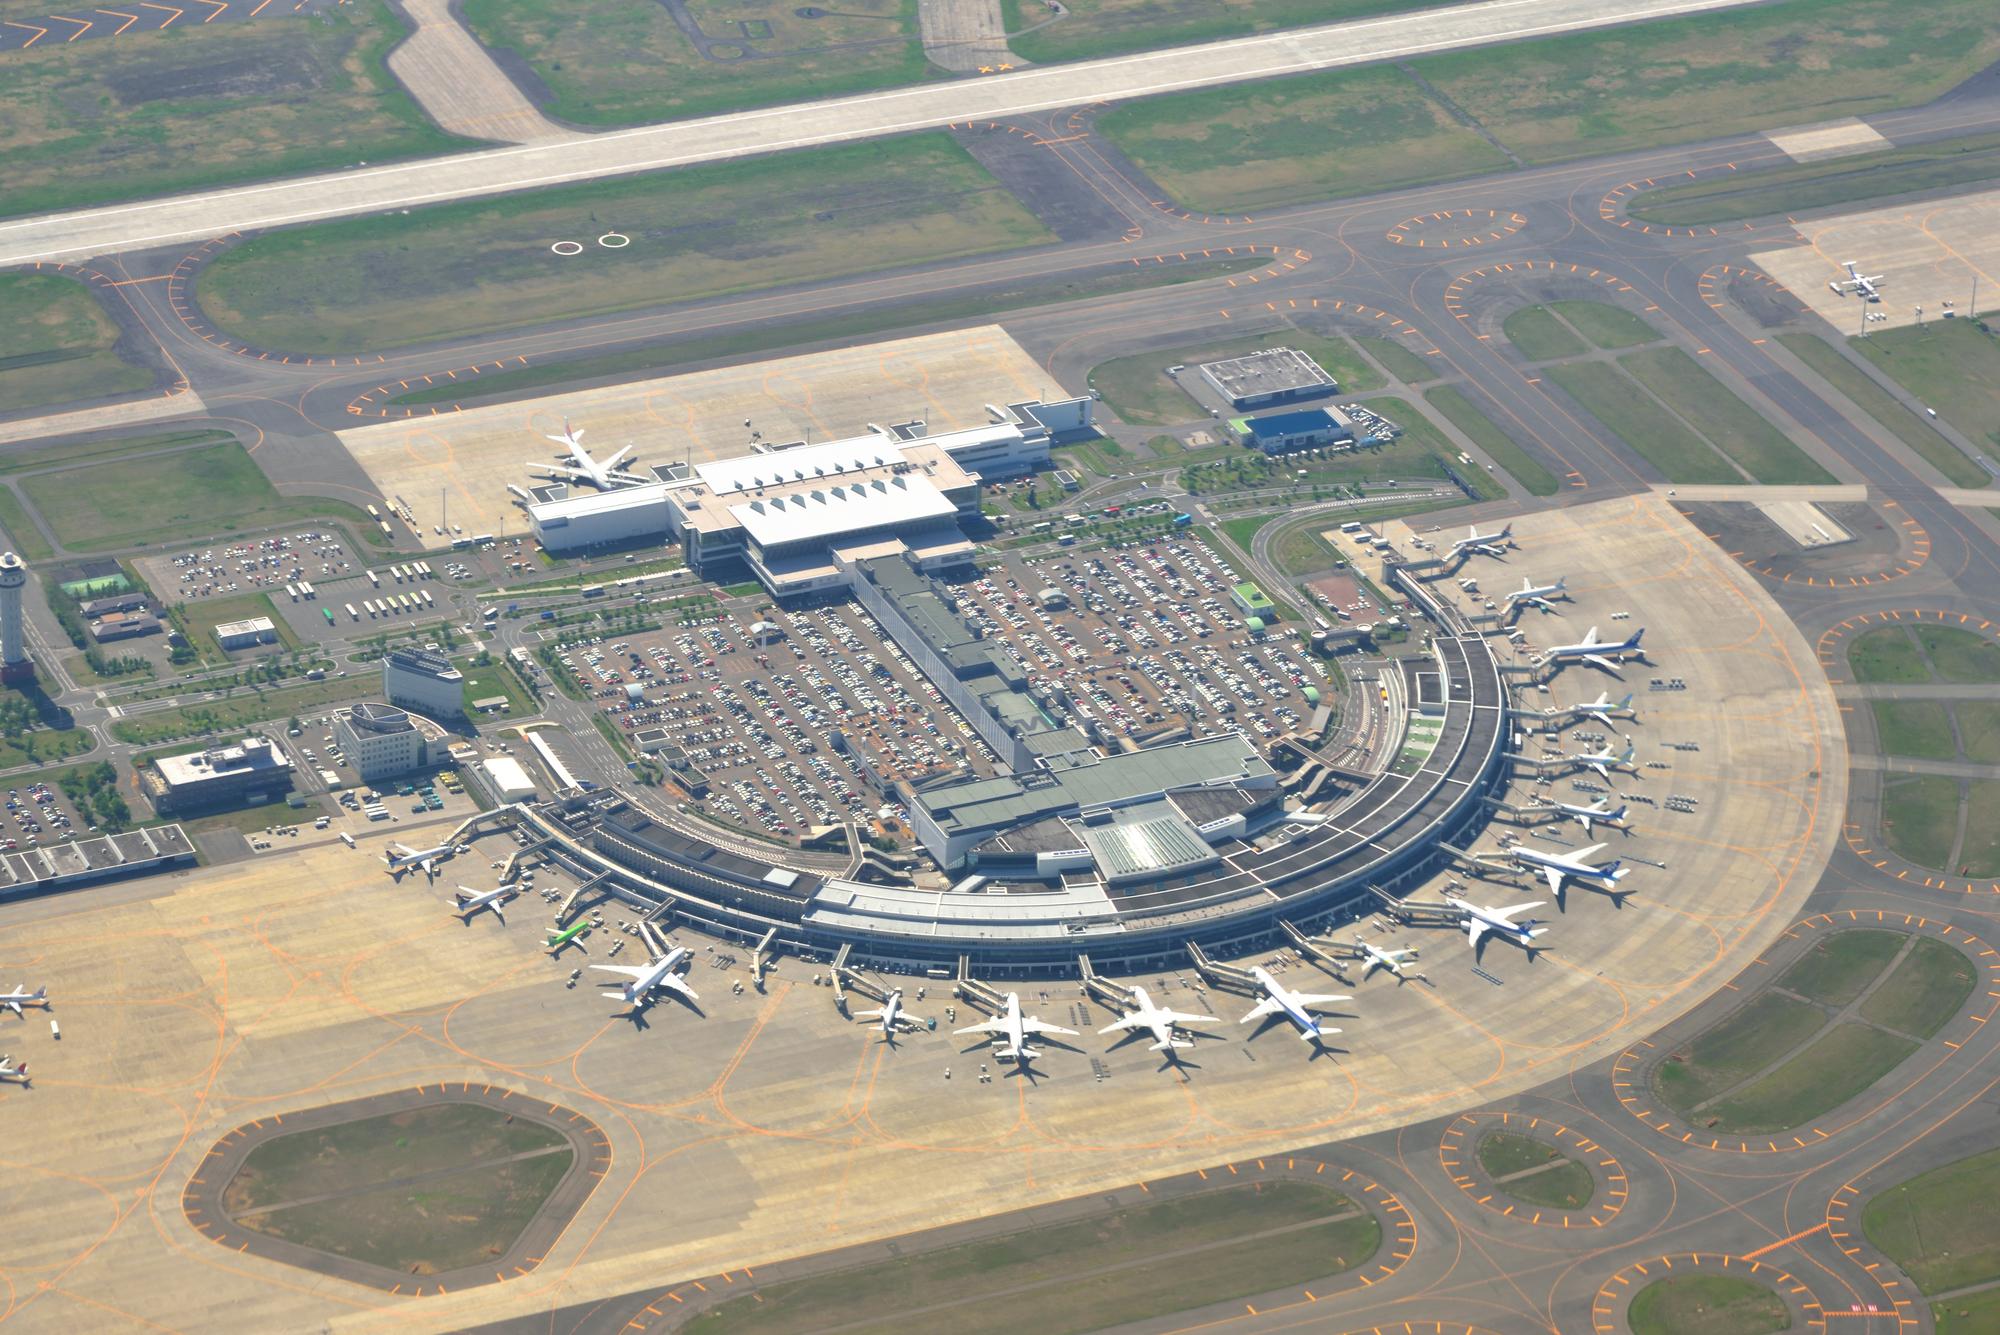 JALの新千歳空港の出発ロビー・到着ロビーはどこにある?